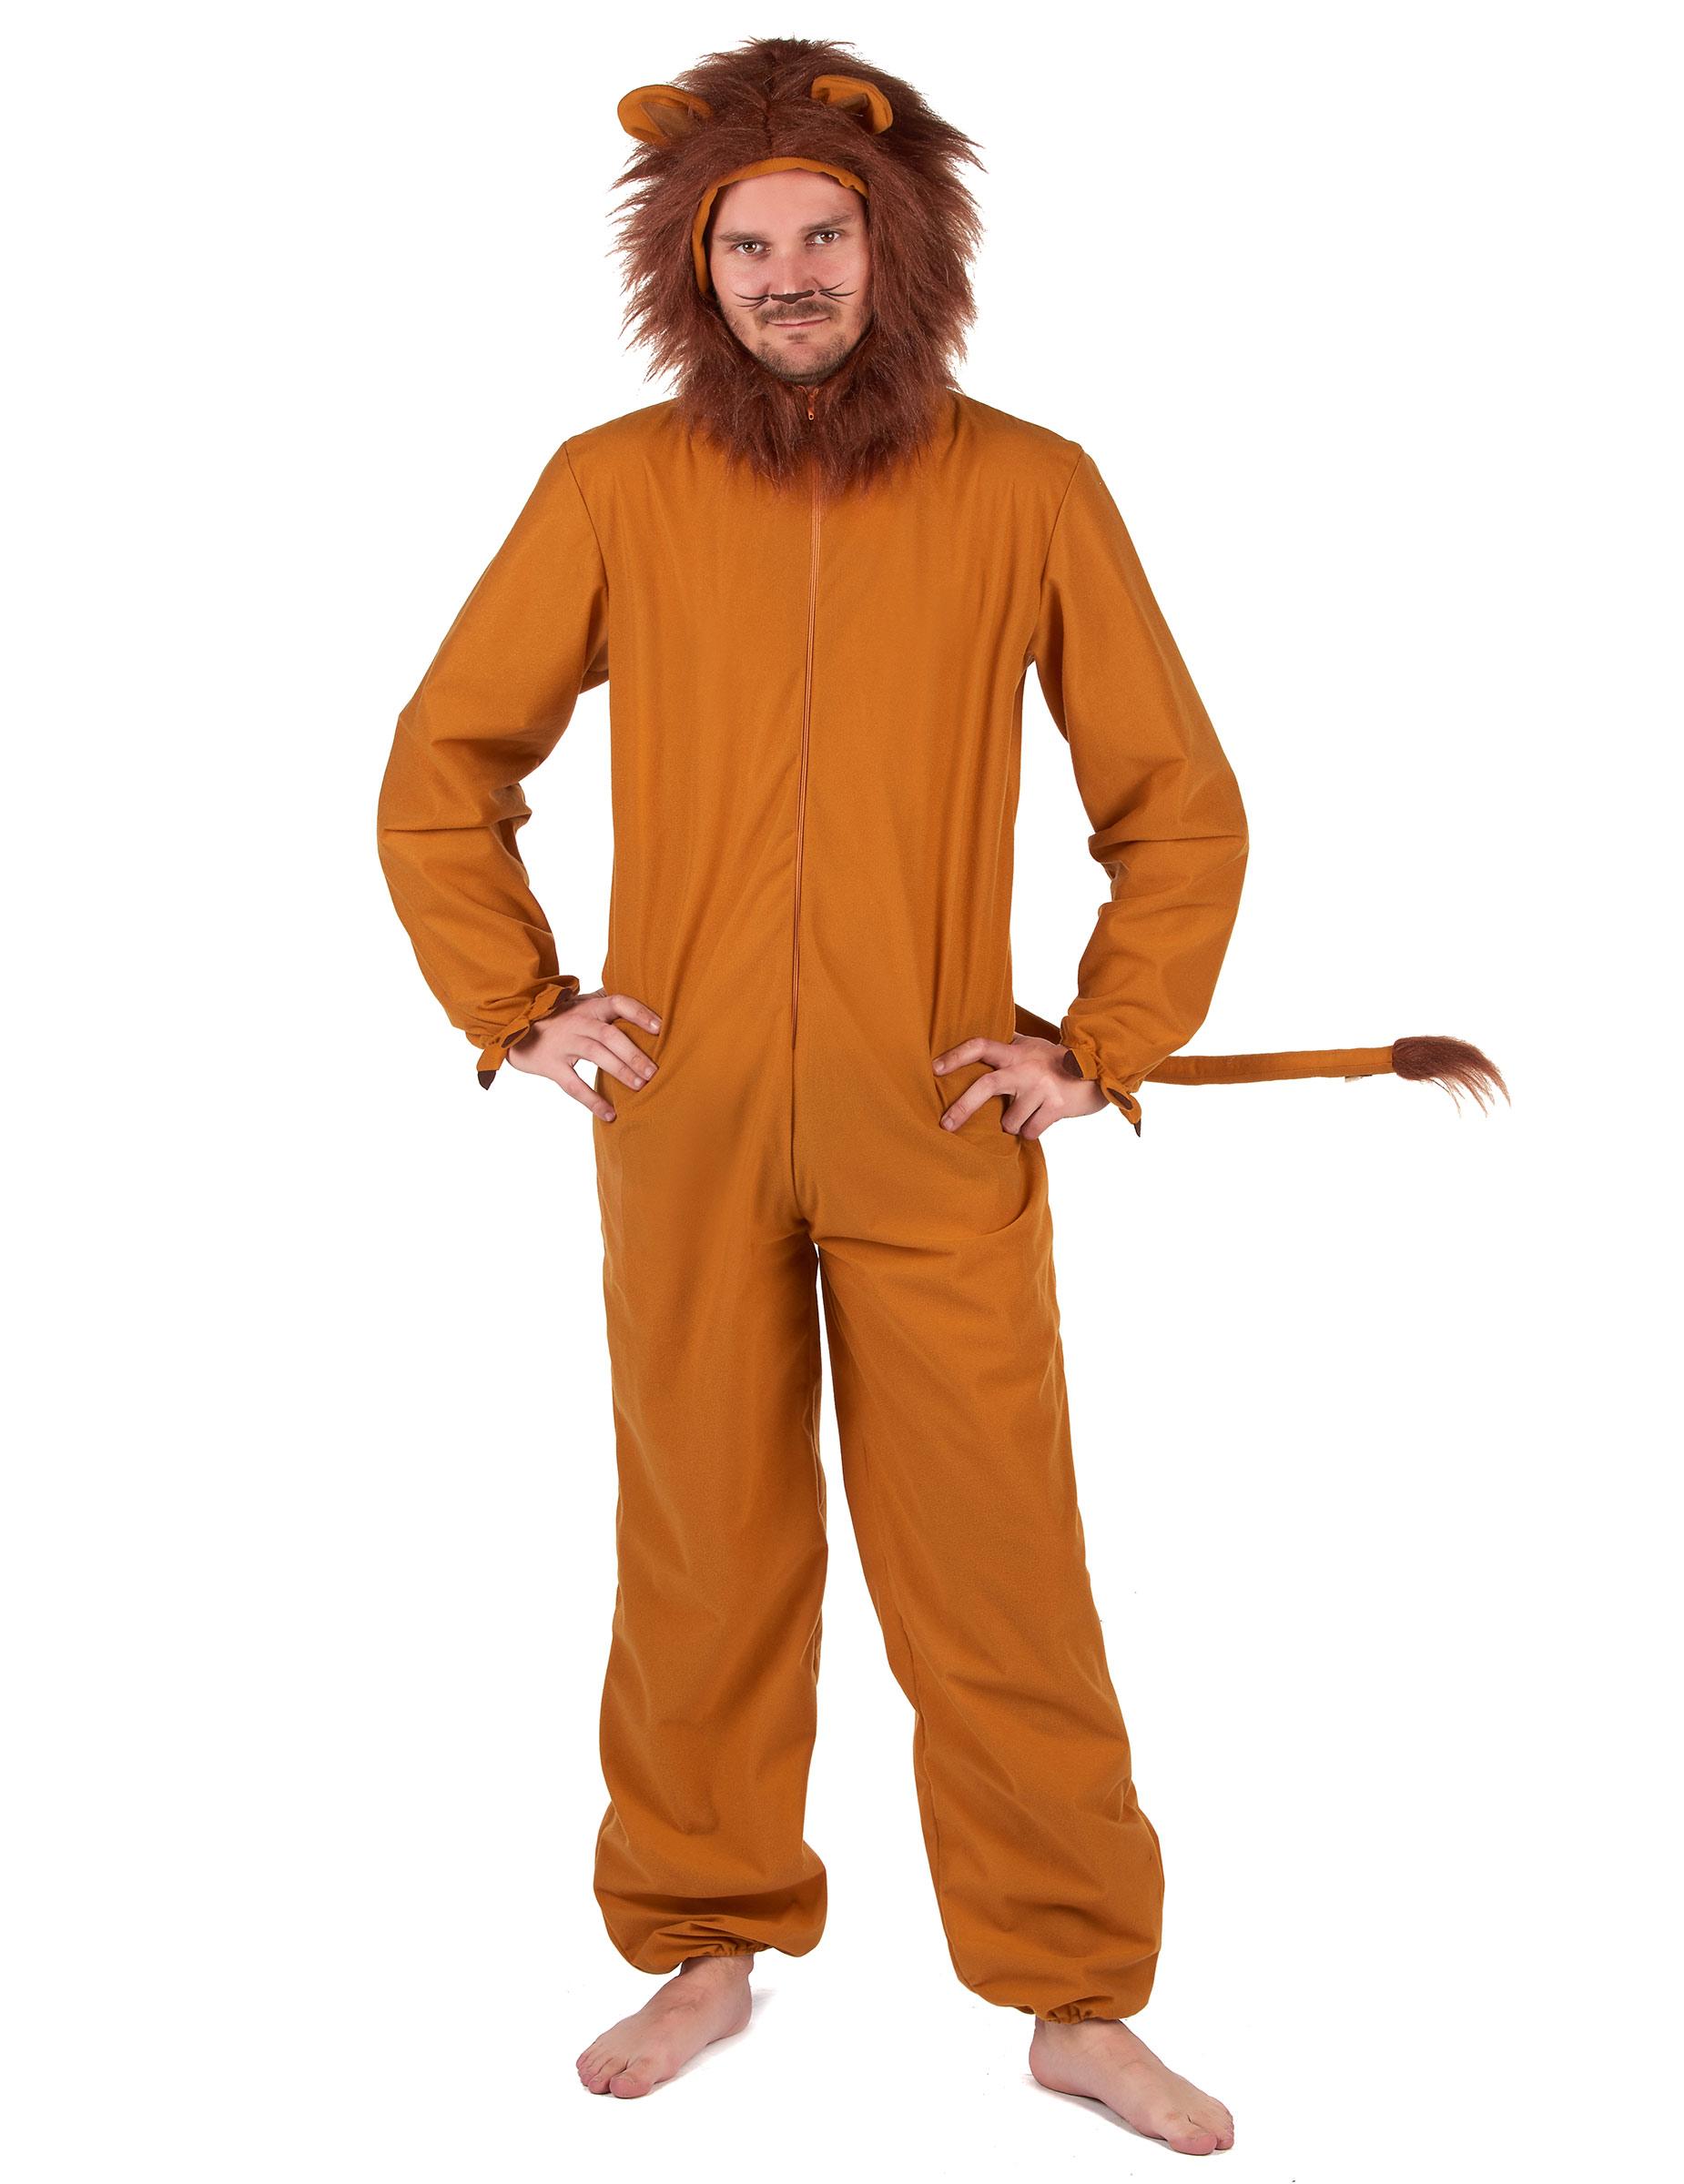 Lowen Kostum Fur Herren Faschingskostum Braun Gunstige Faschings